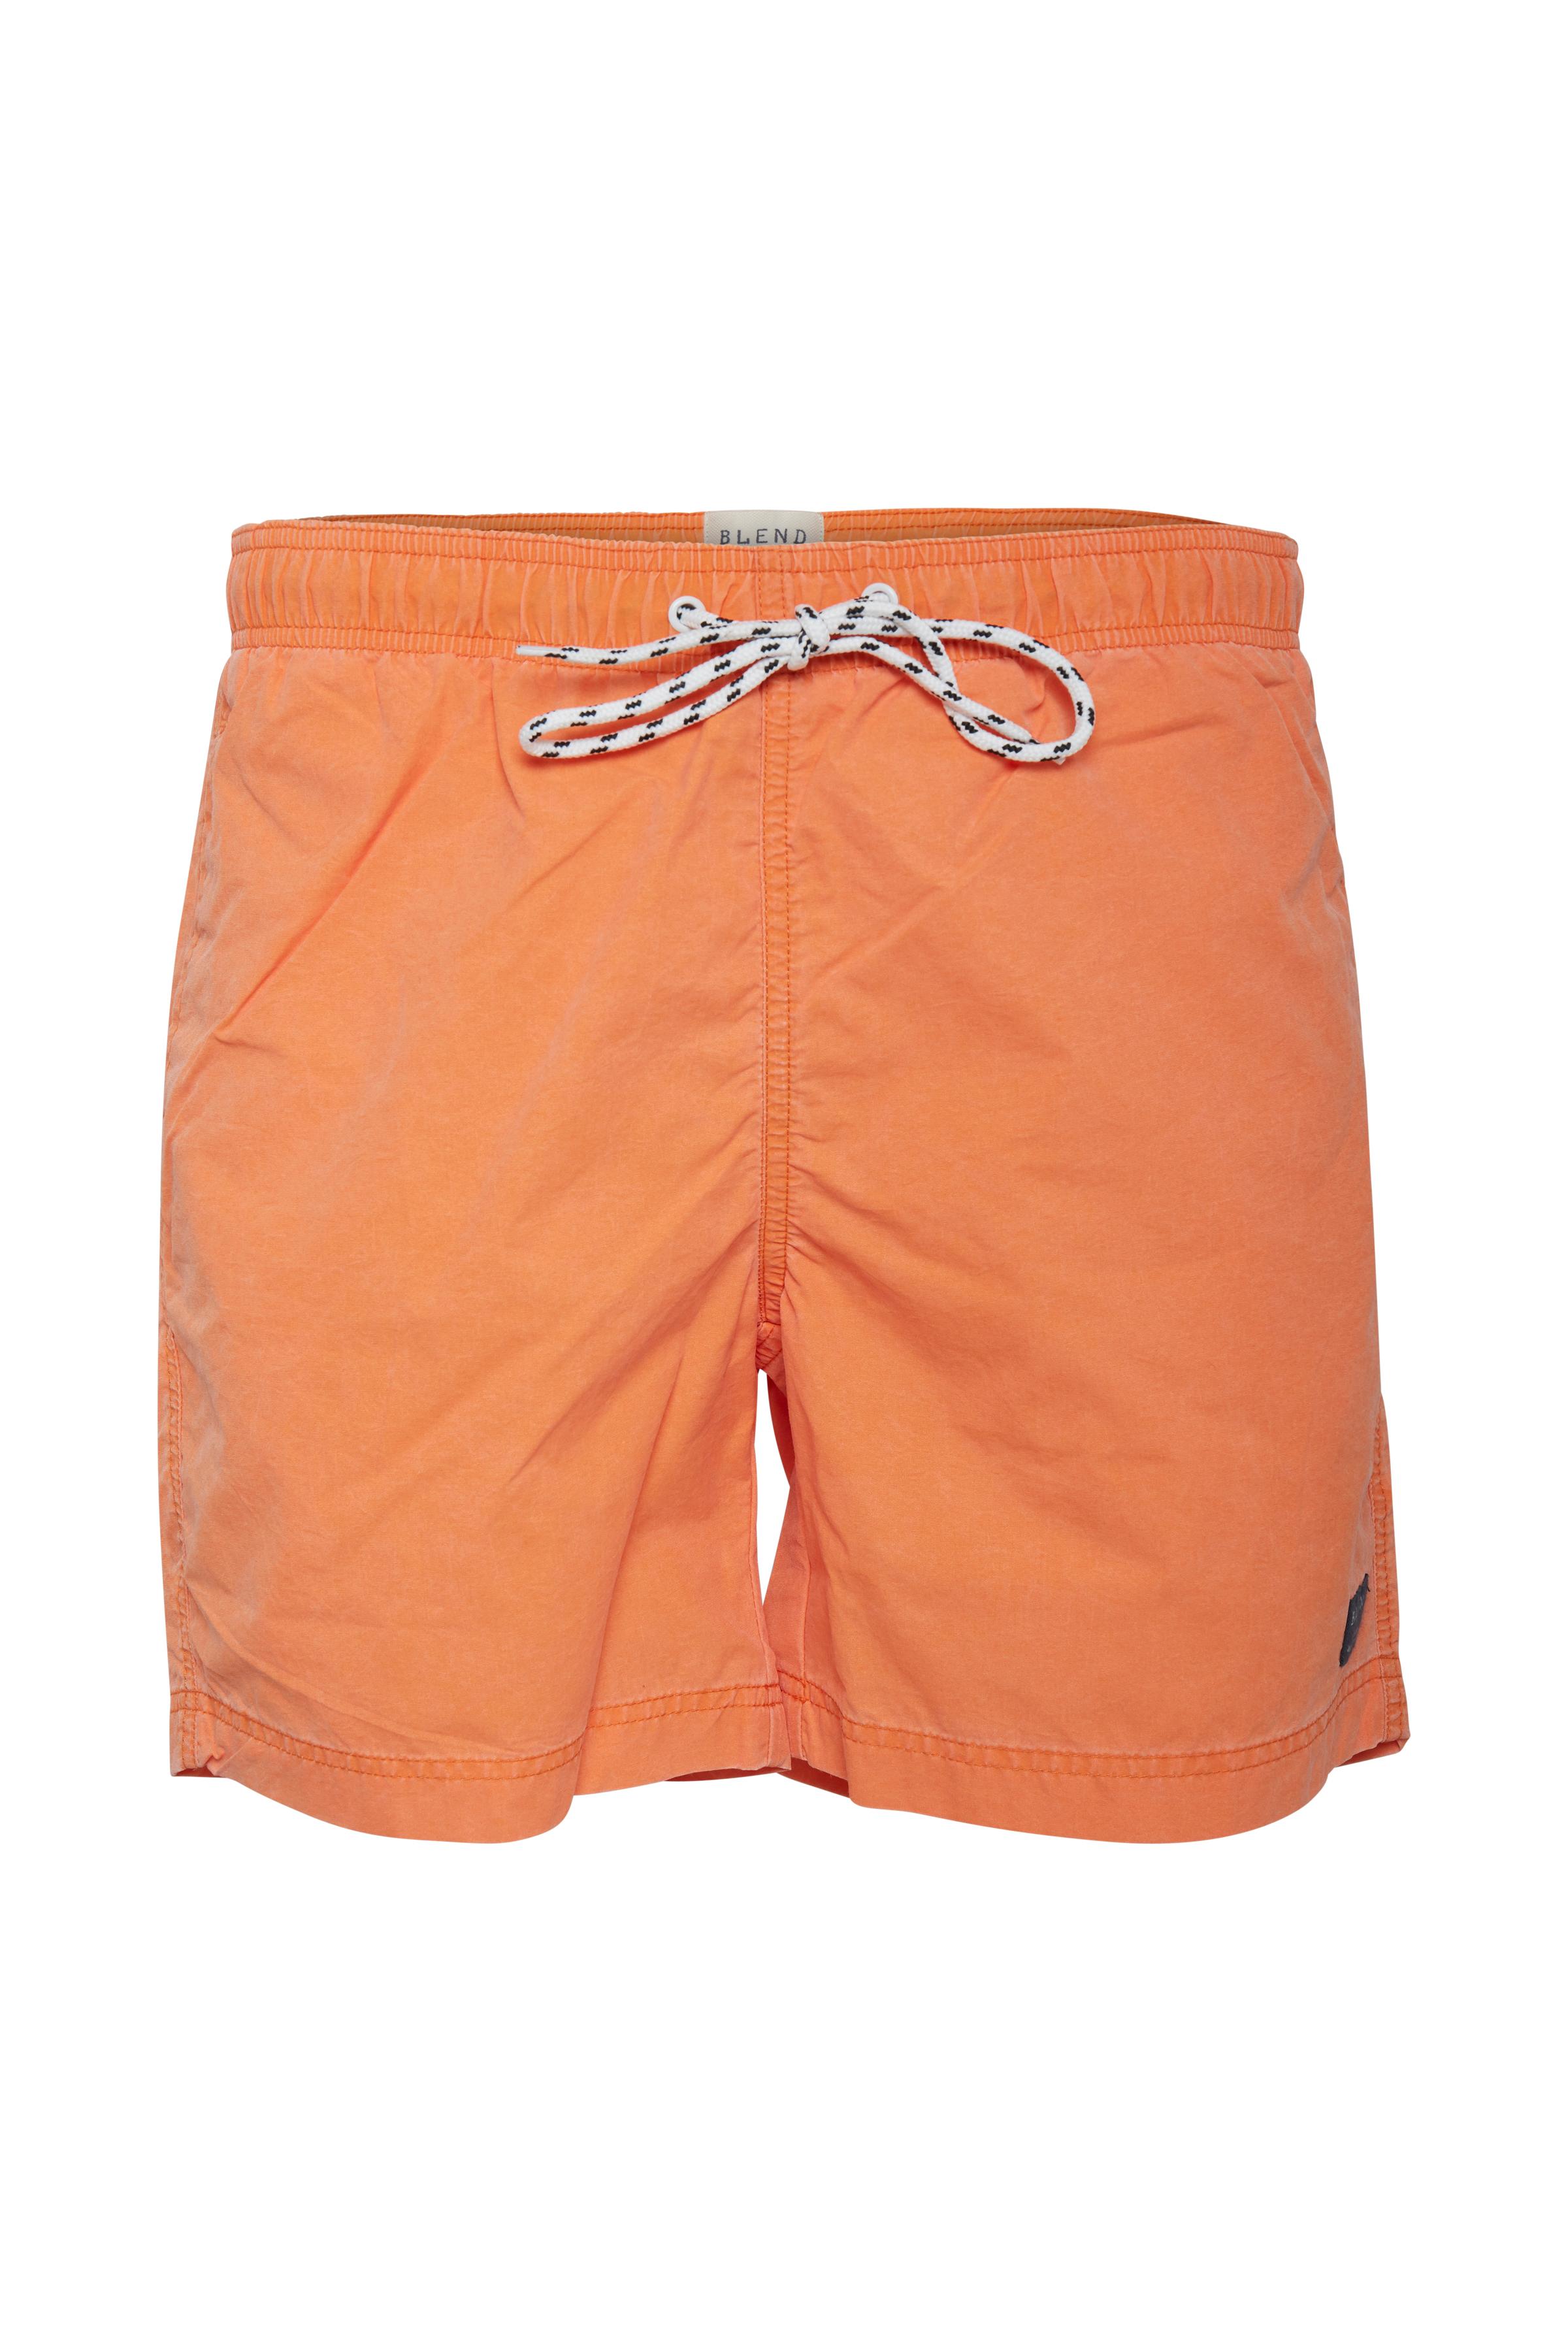 Image of Blend He Herre Badetøj - Sun Orange